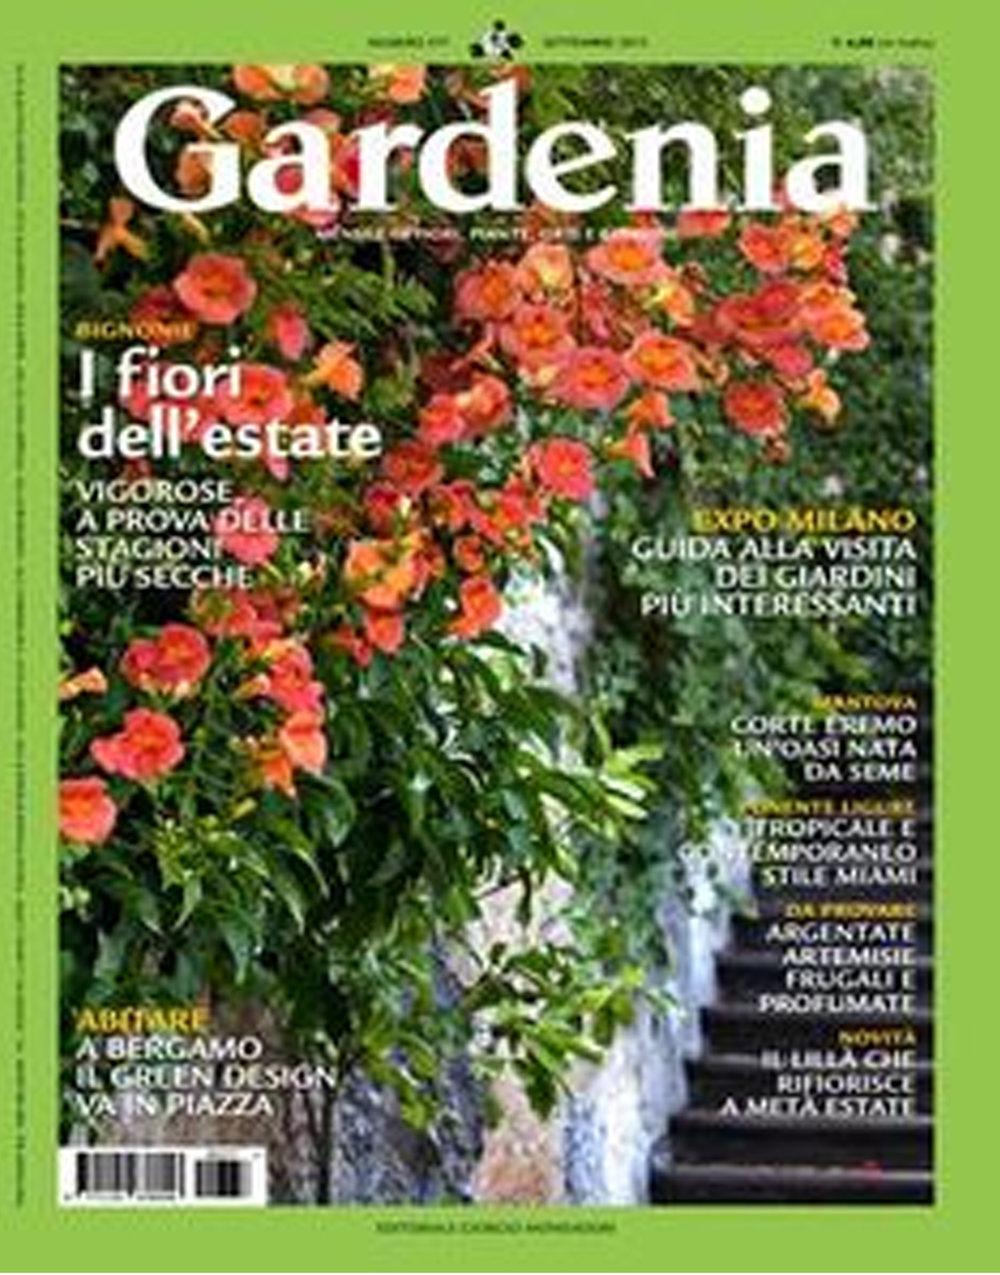 Gardenia n.377_pagina 32